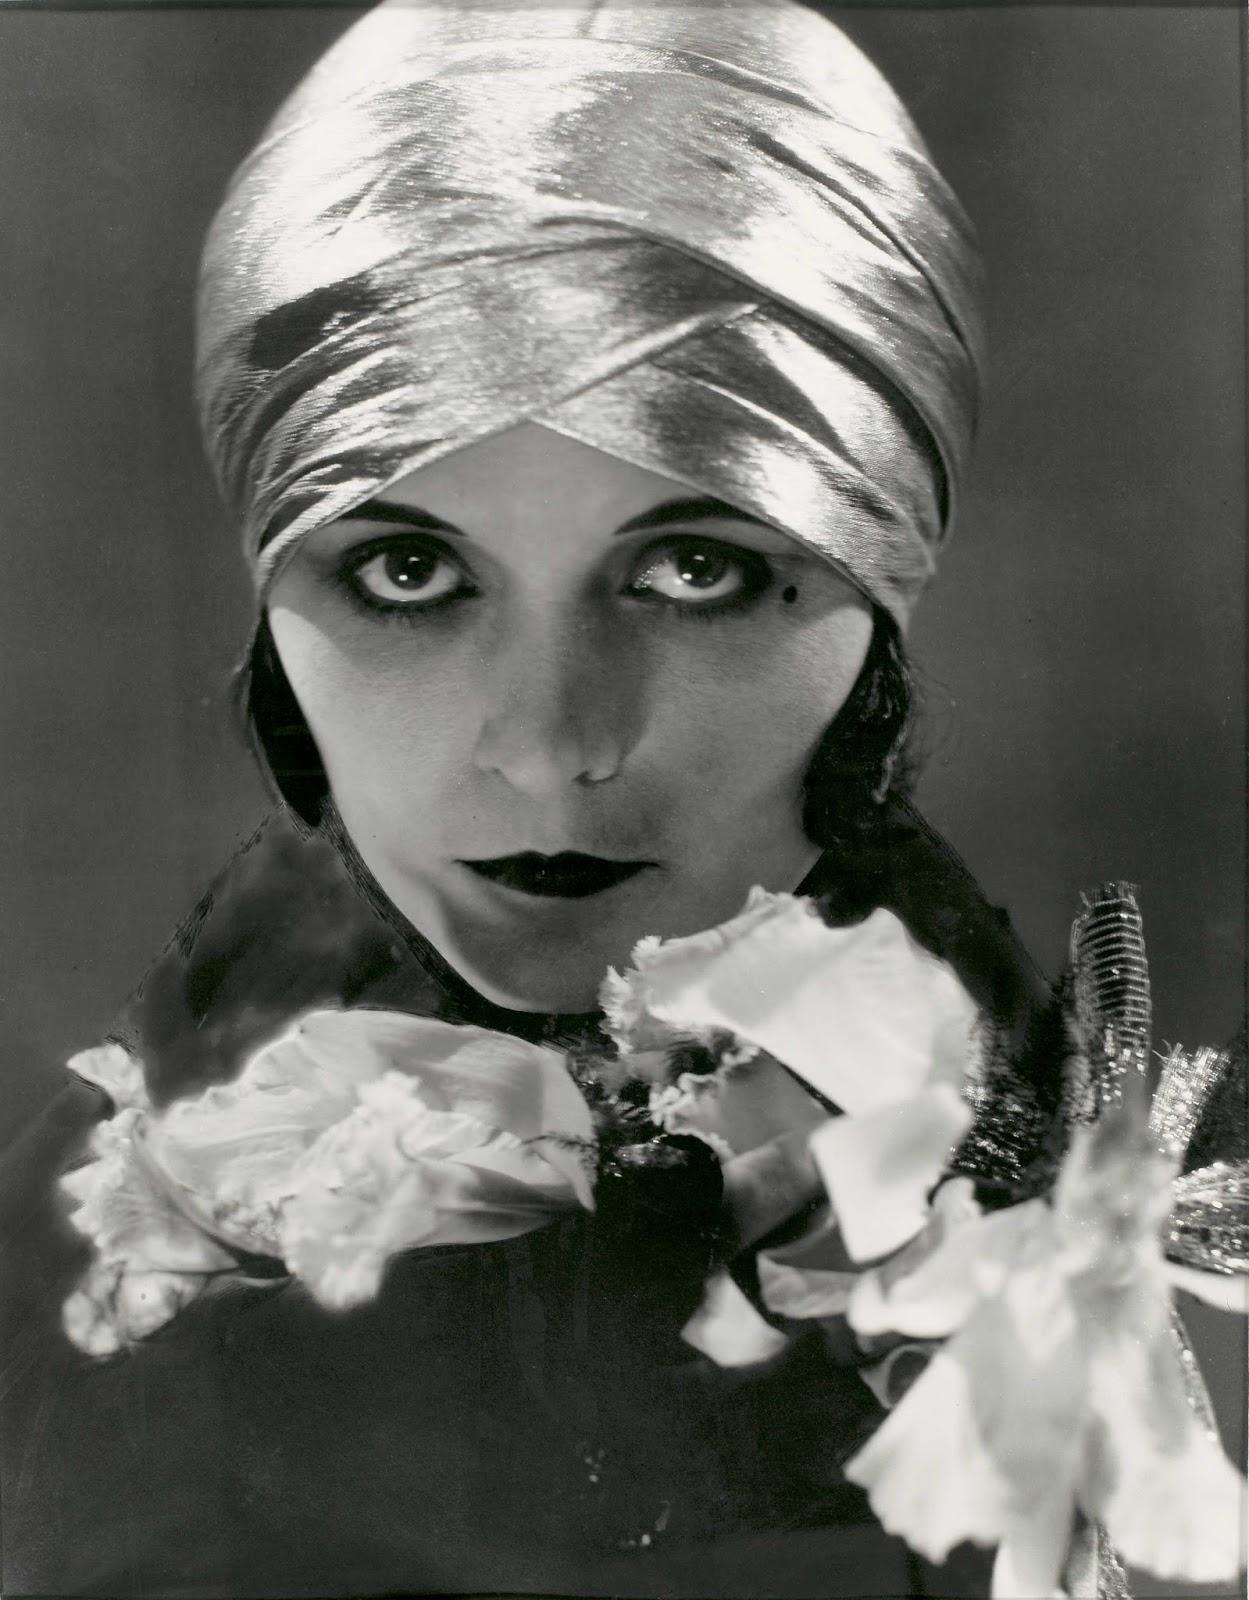 Pola Negri, Edward Steichen. Fotografía | Photography